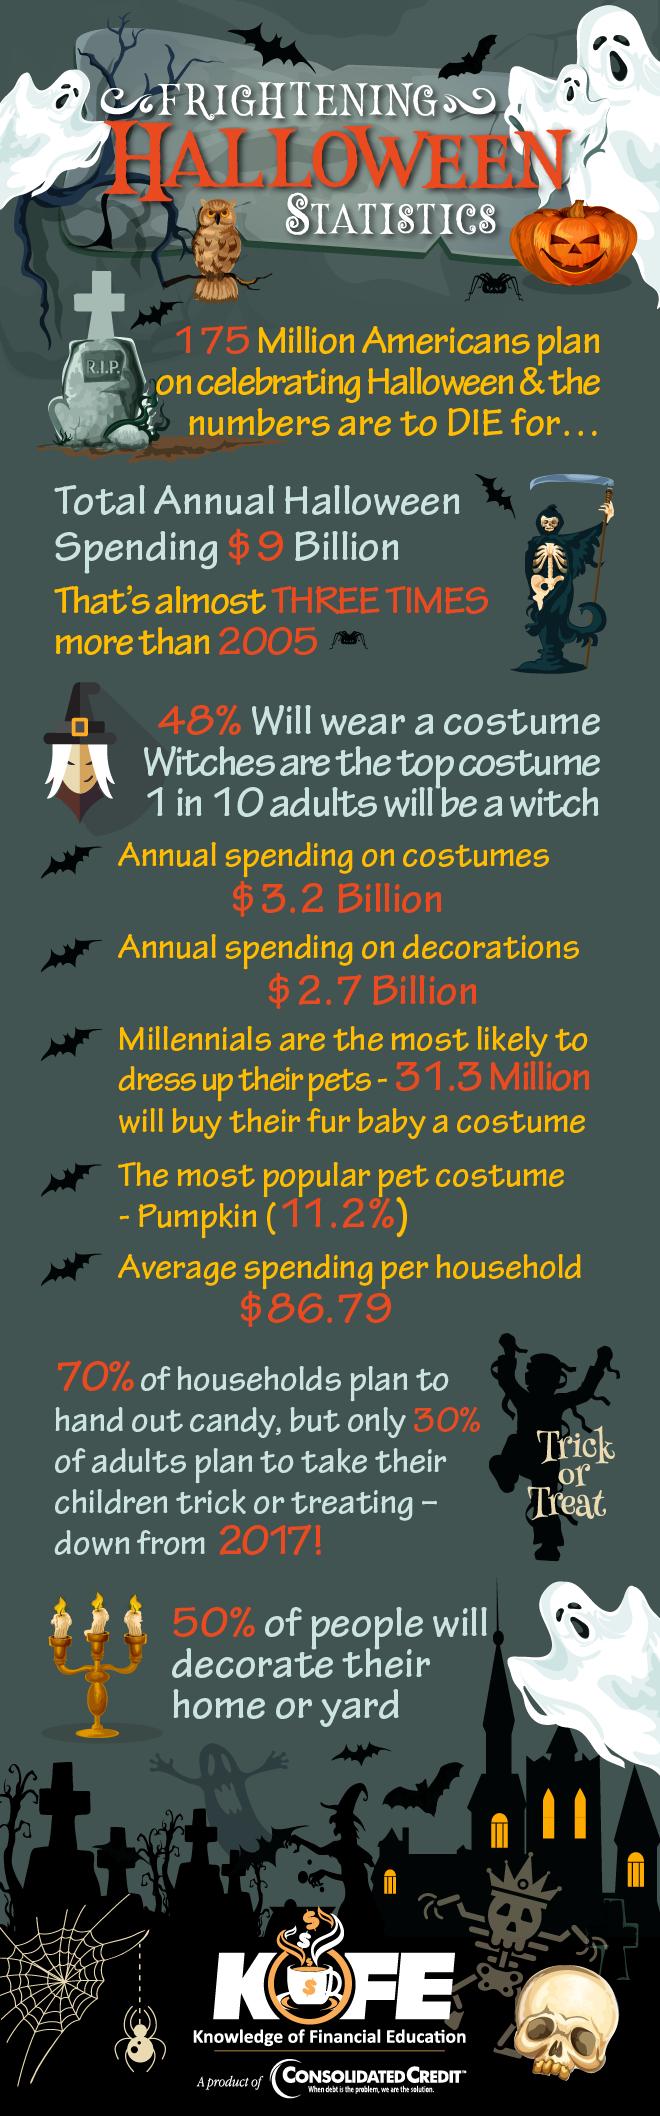 Frightening Halloween IG 2018_KOFE